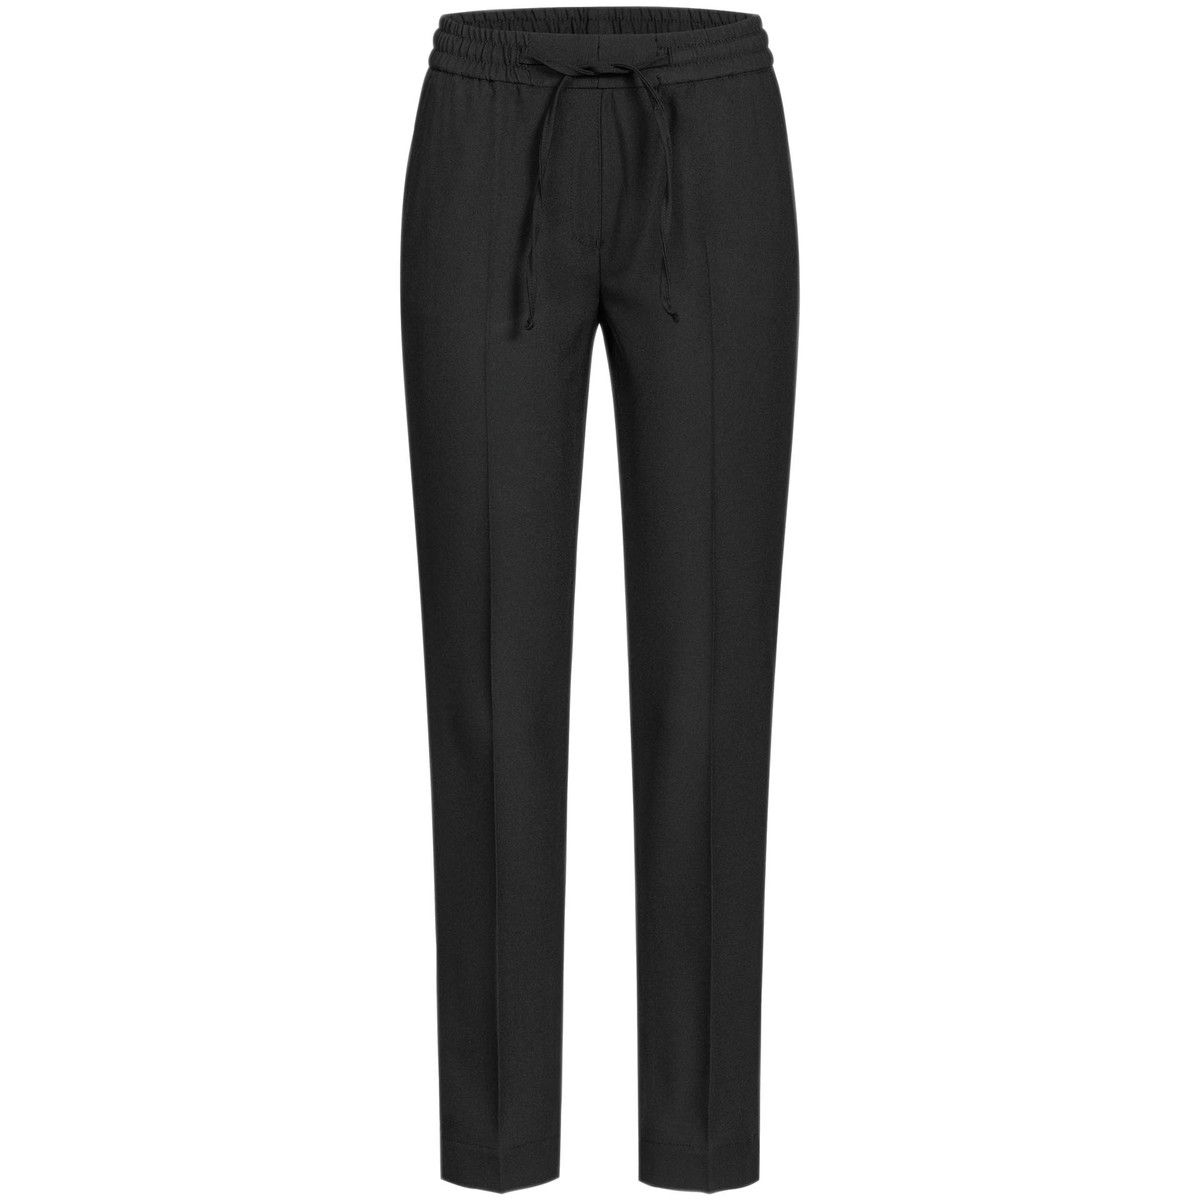 "Damen-Hose ""Joggpants"" schwarz Größe 42"